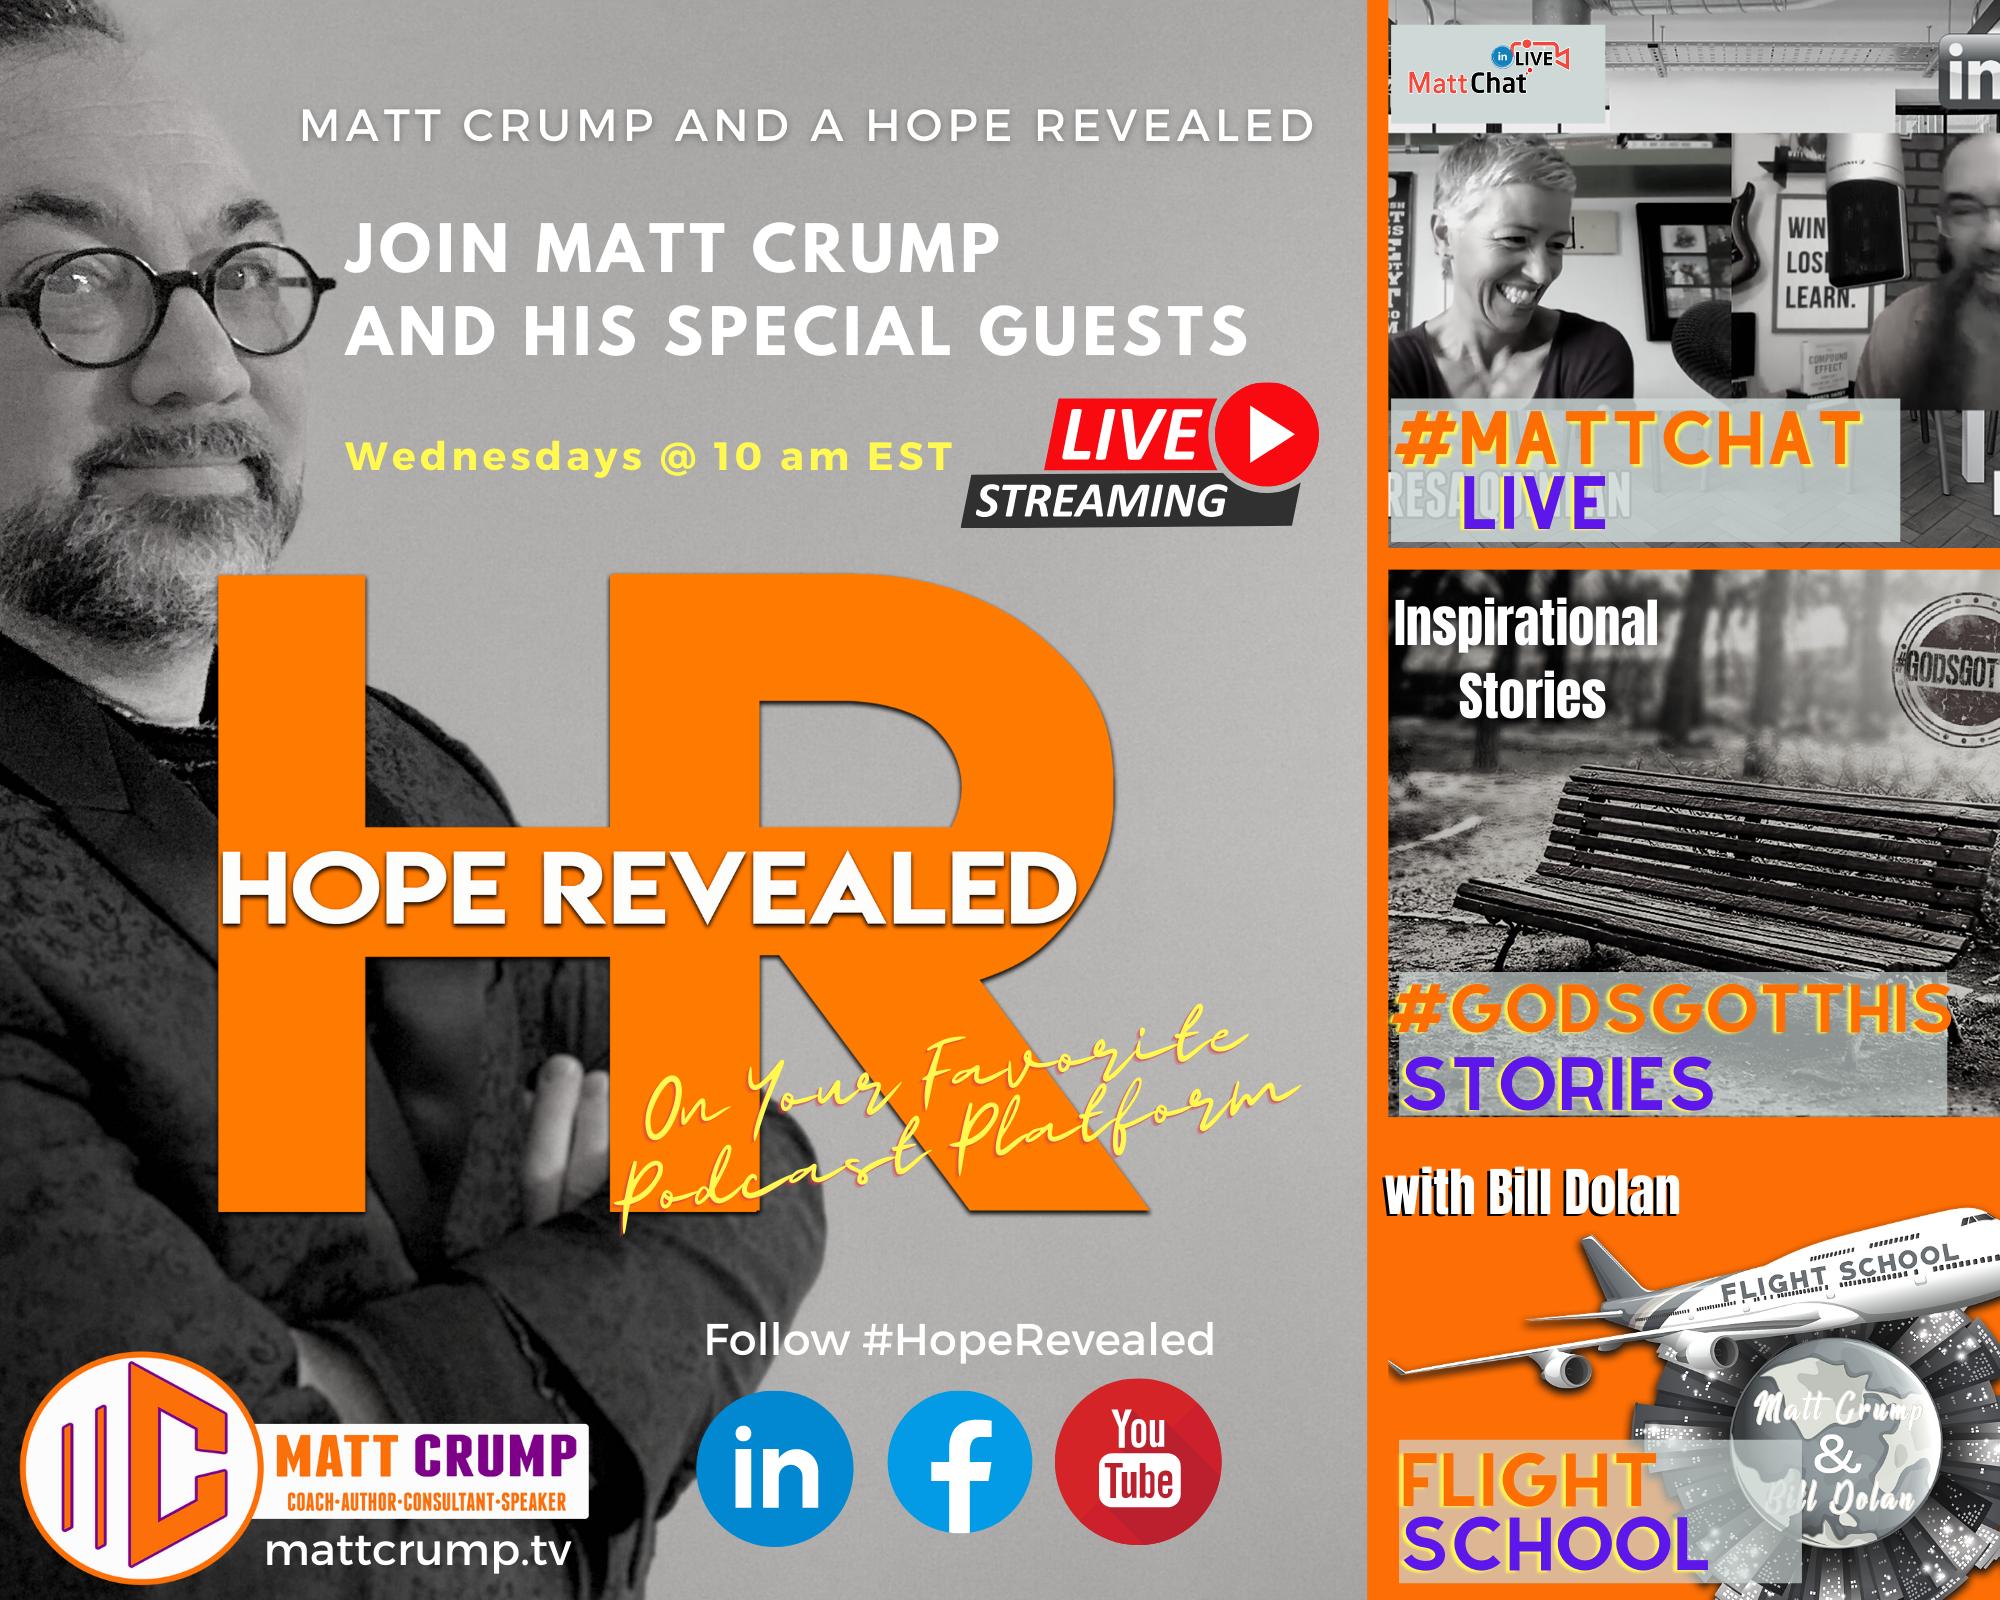 Matt Crump and a Hope Revealed